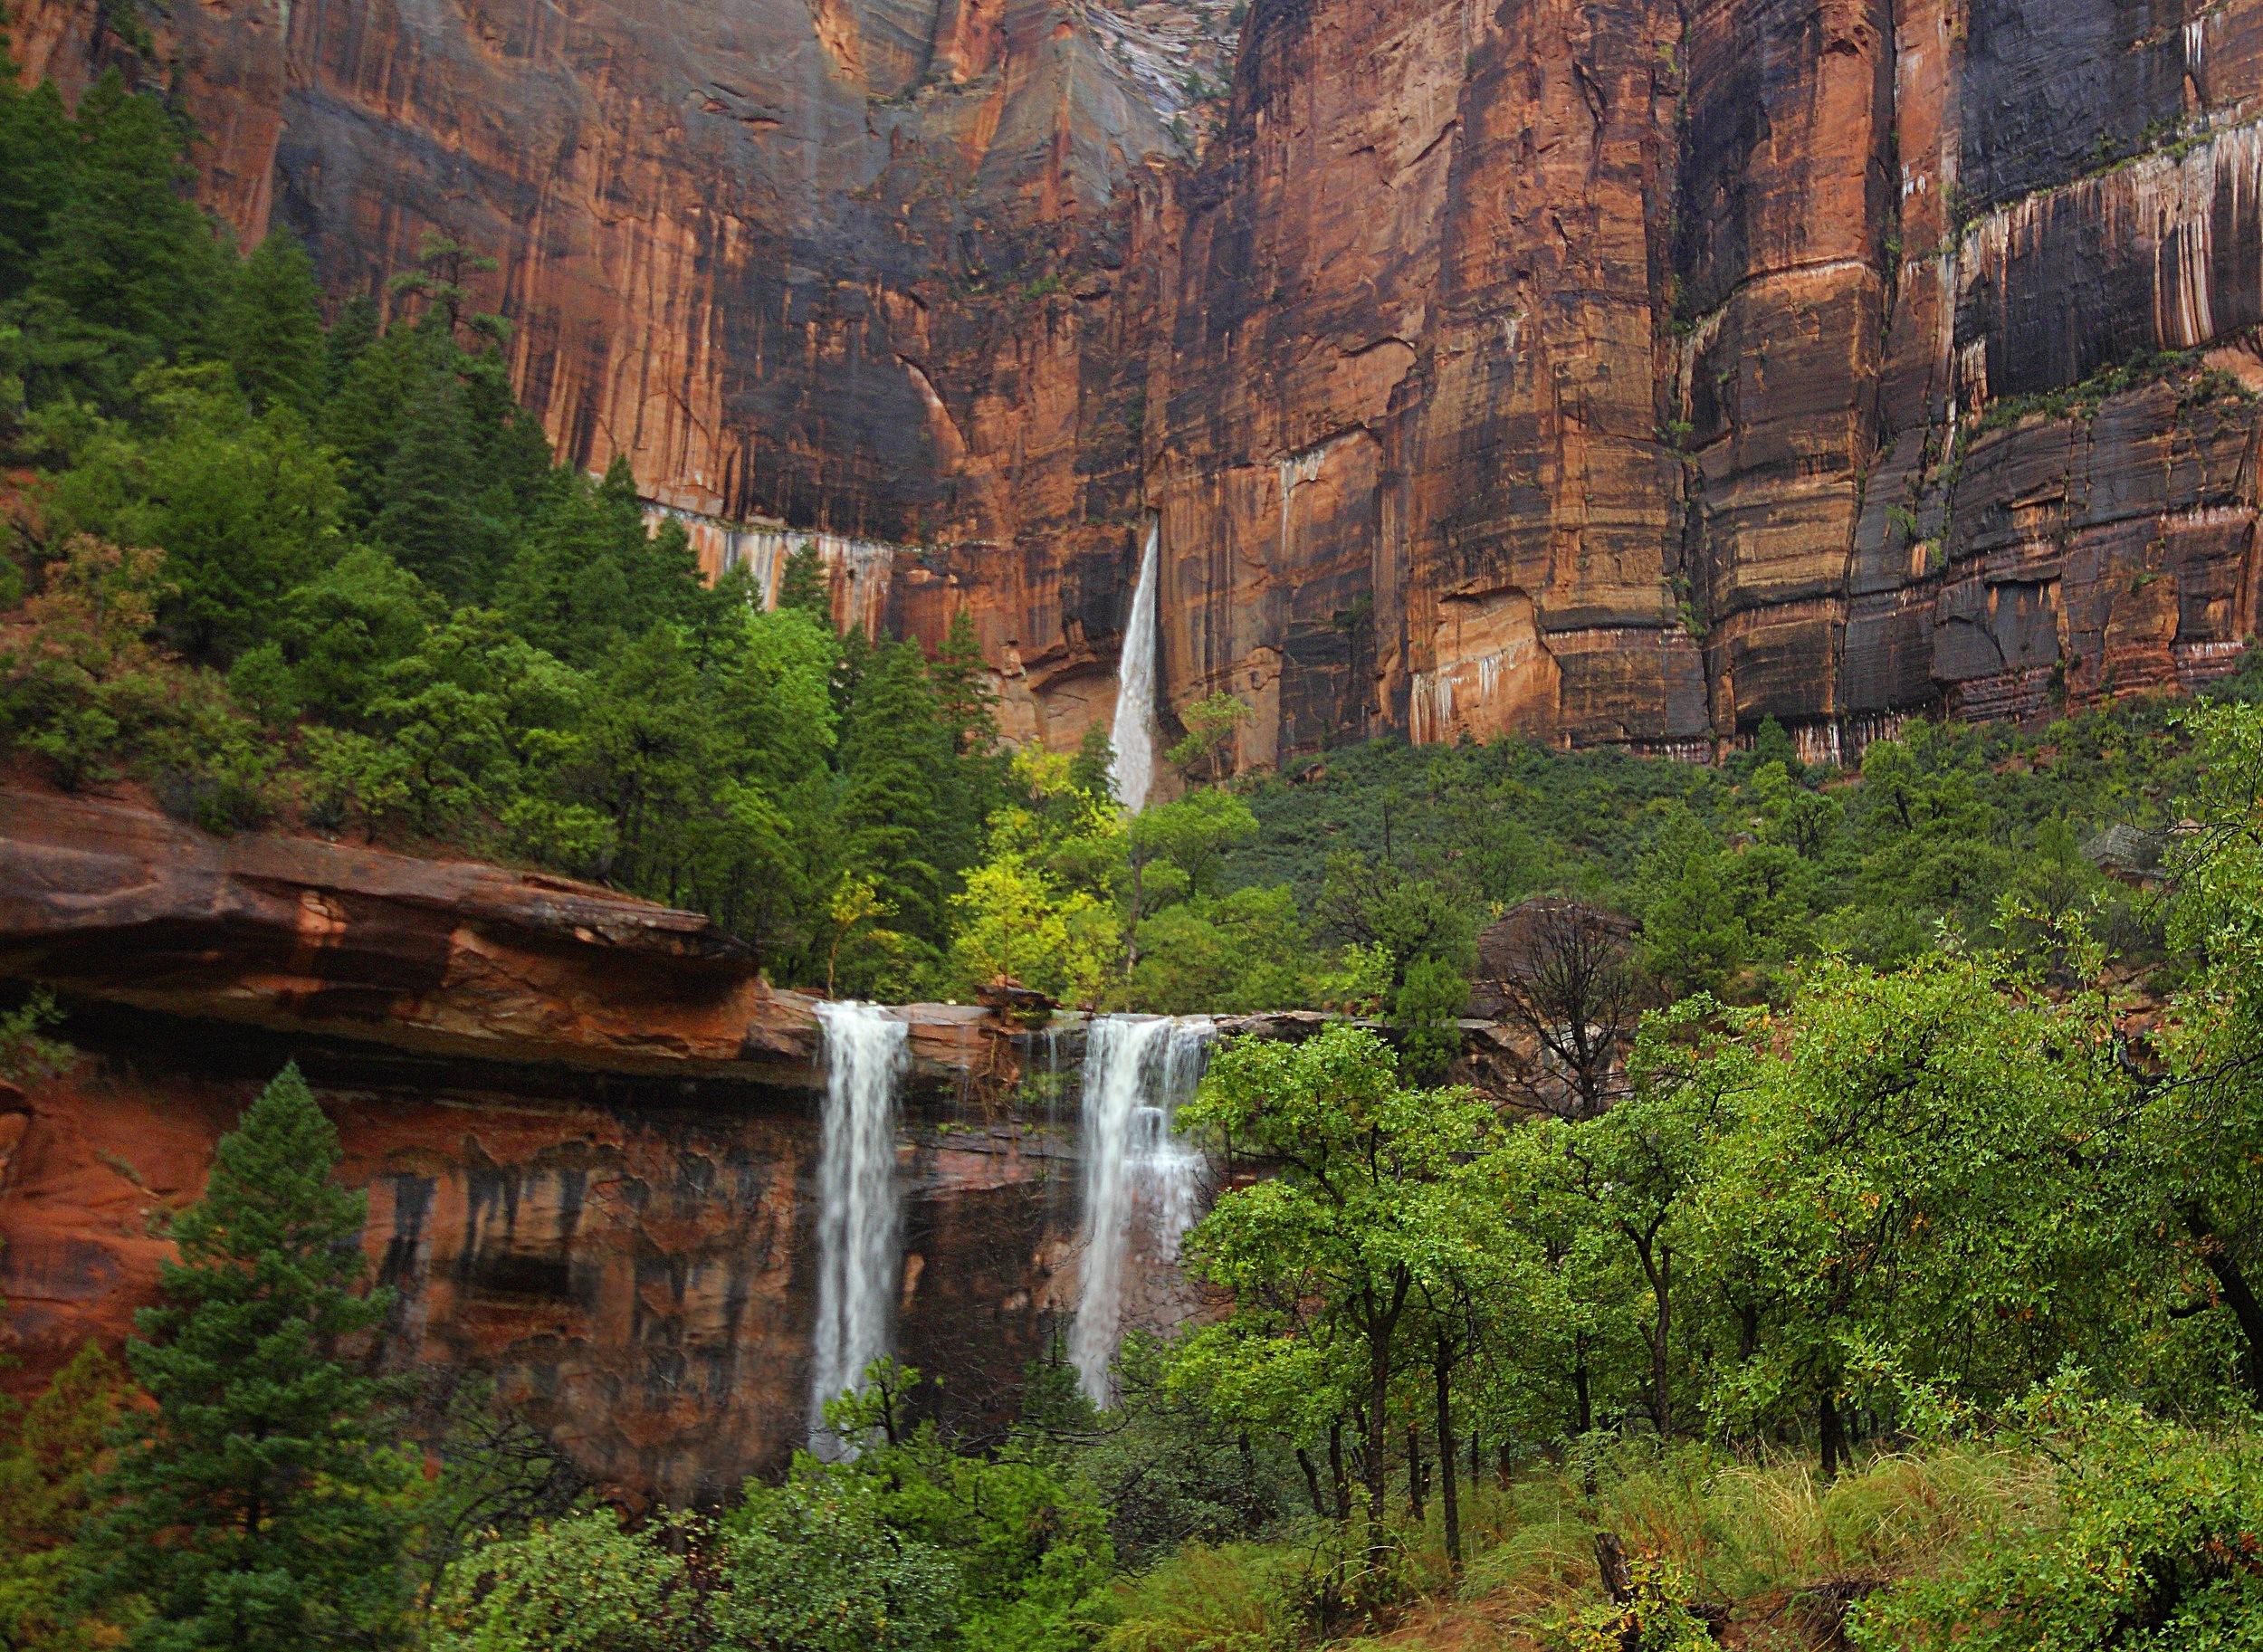 Waterfalls after rain at the Emerald Pools at Zion National Park